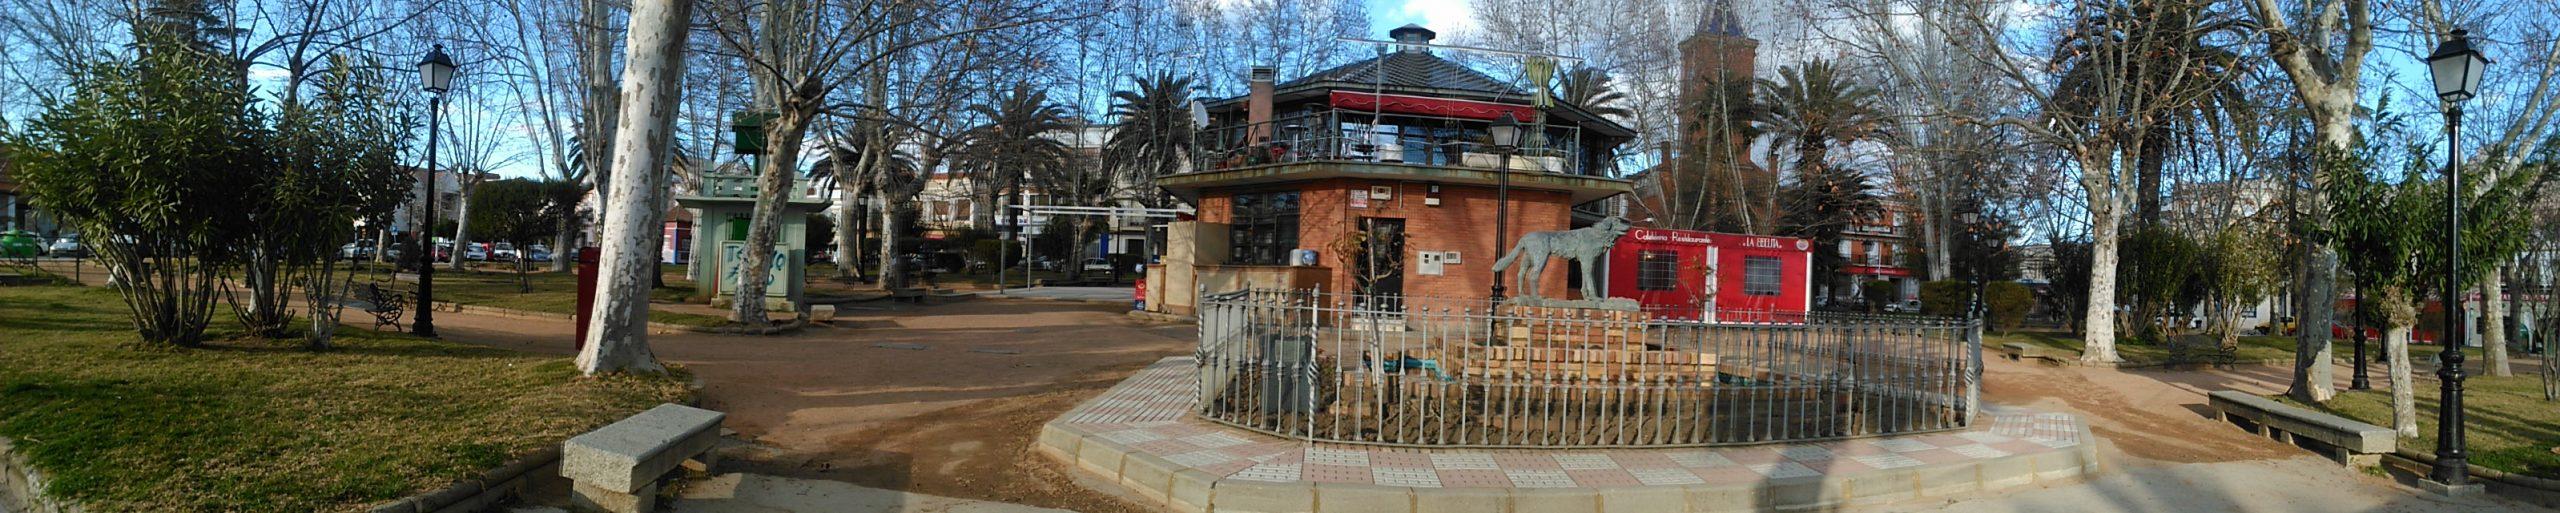 plaza santa barbara